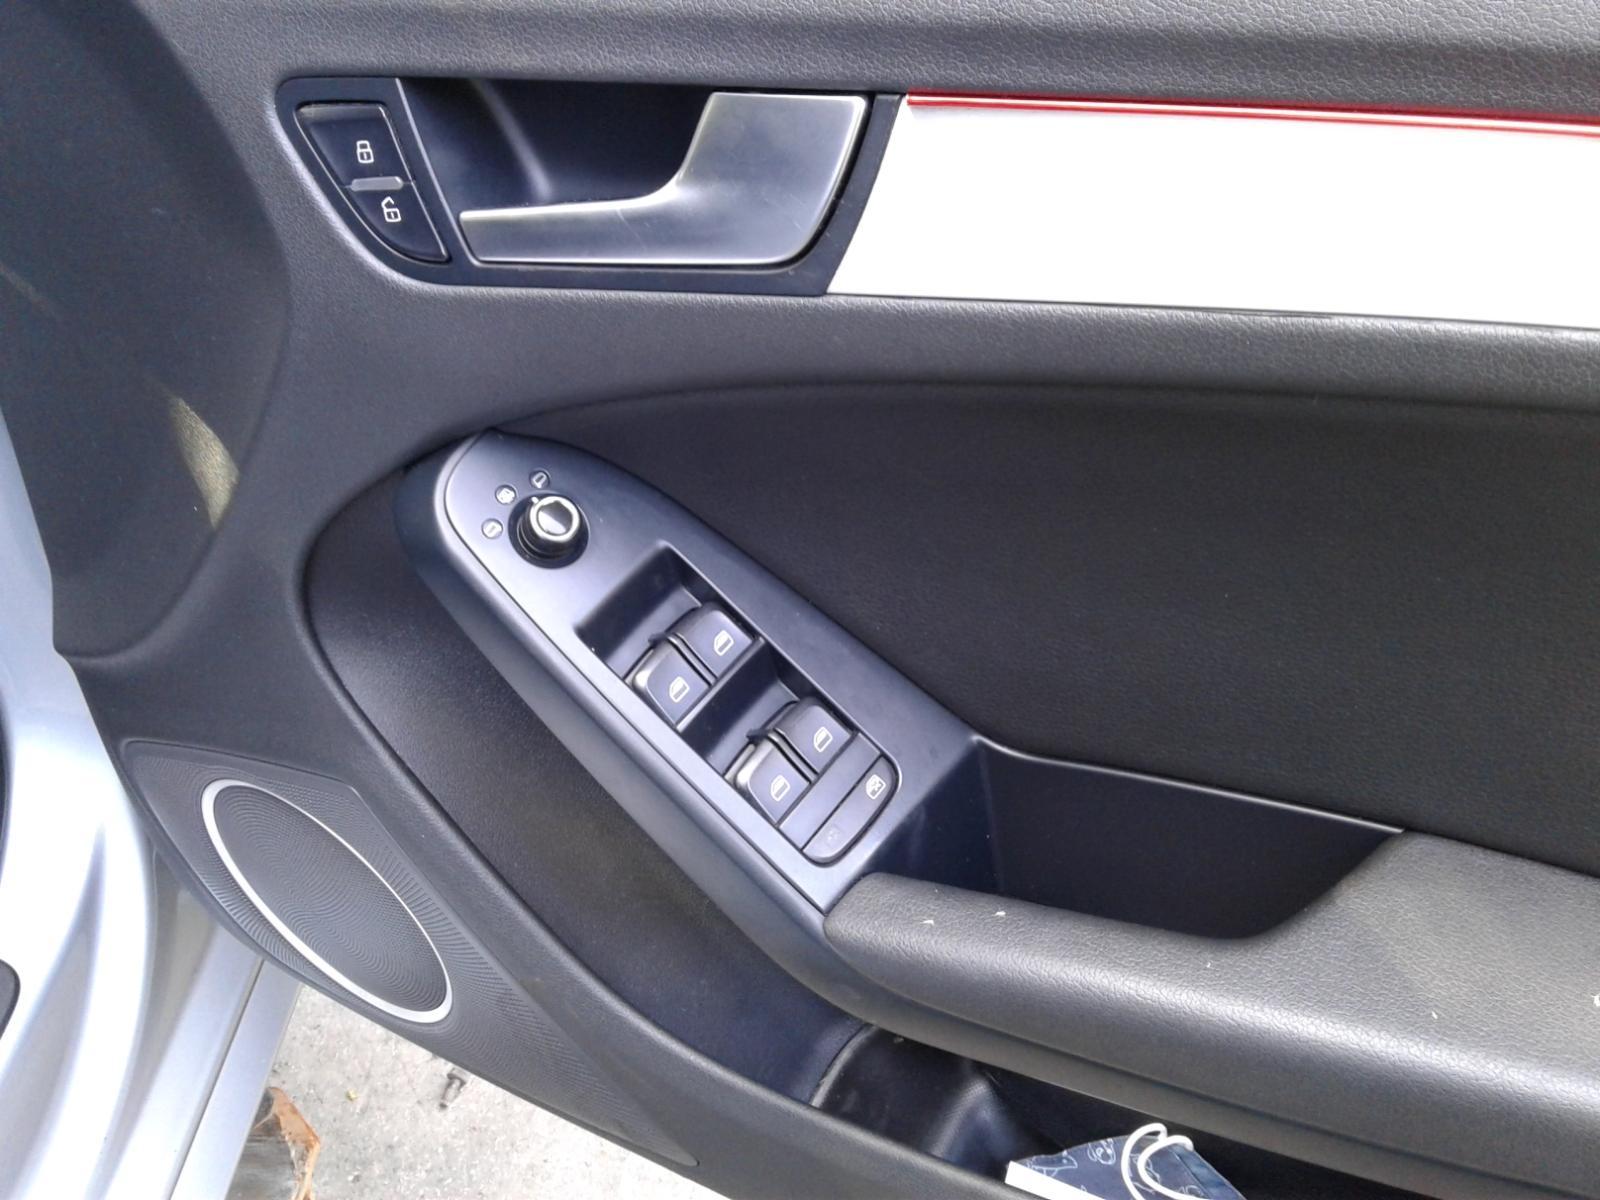 View Auto part AUDI A5 2010 5 Door Hatchback